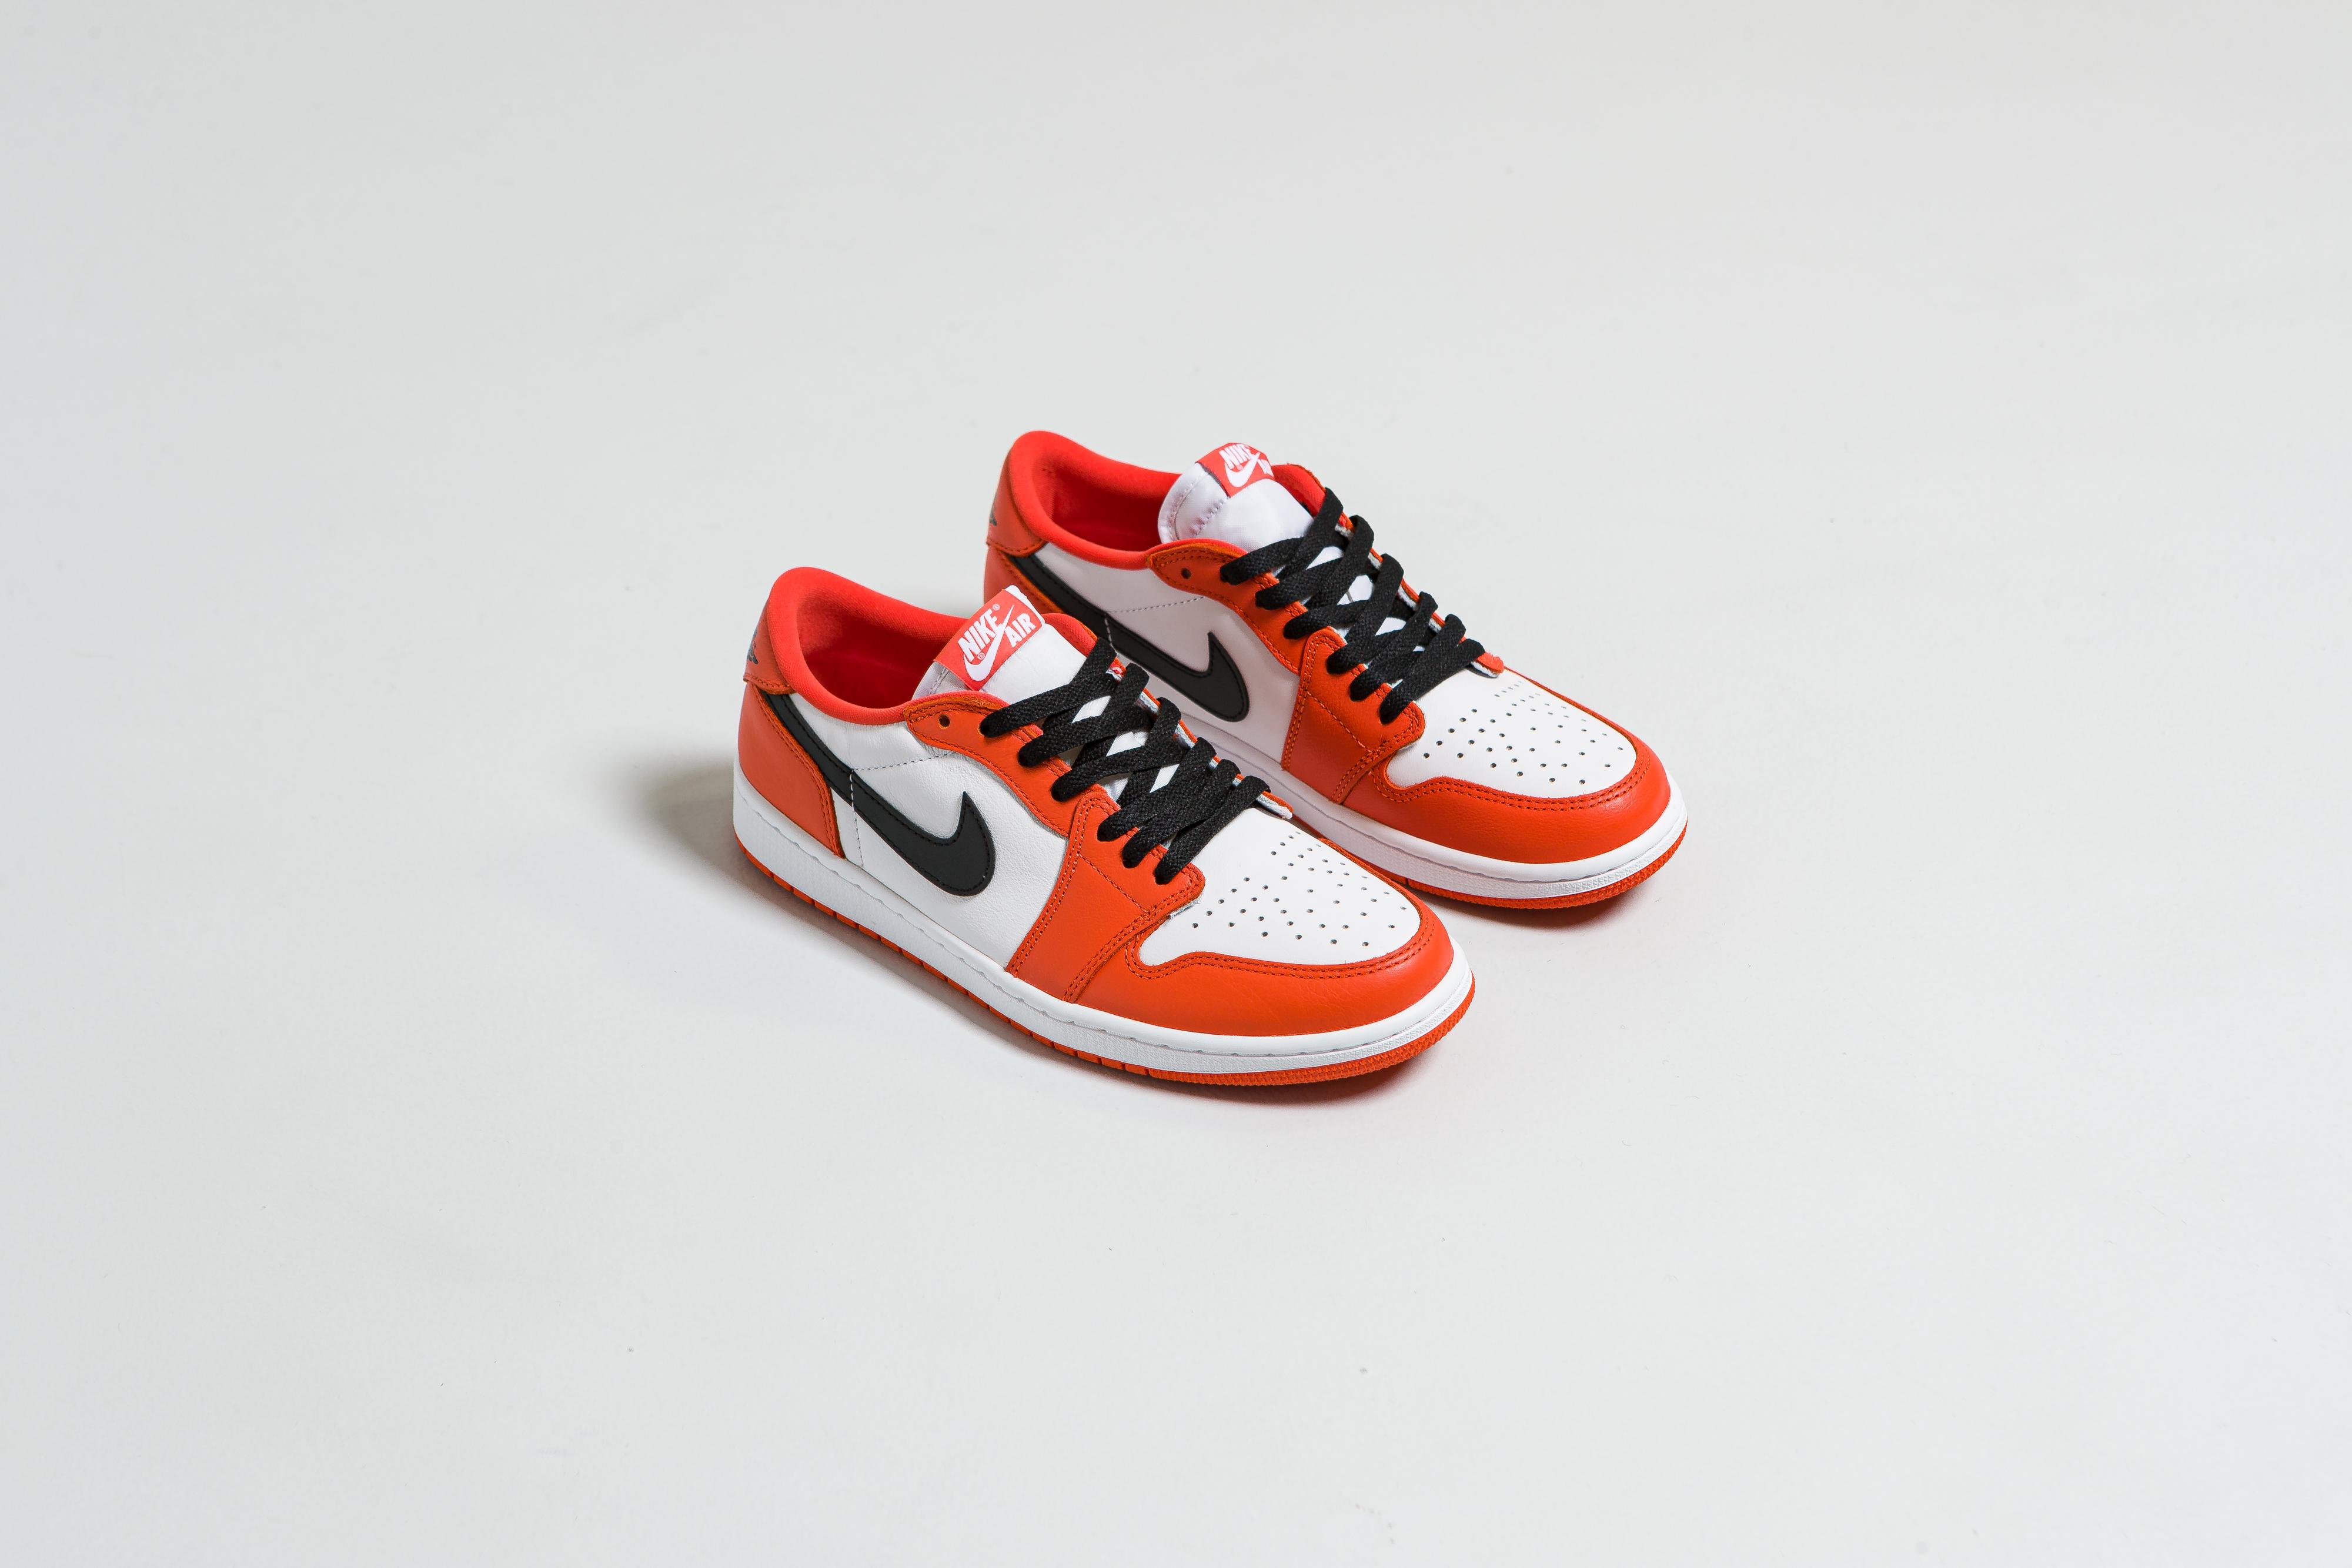 Jordan - Air Jordan 1 Low OG - Orange/Black-White - Up There